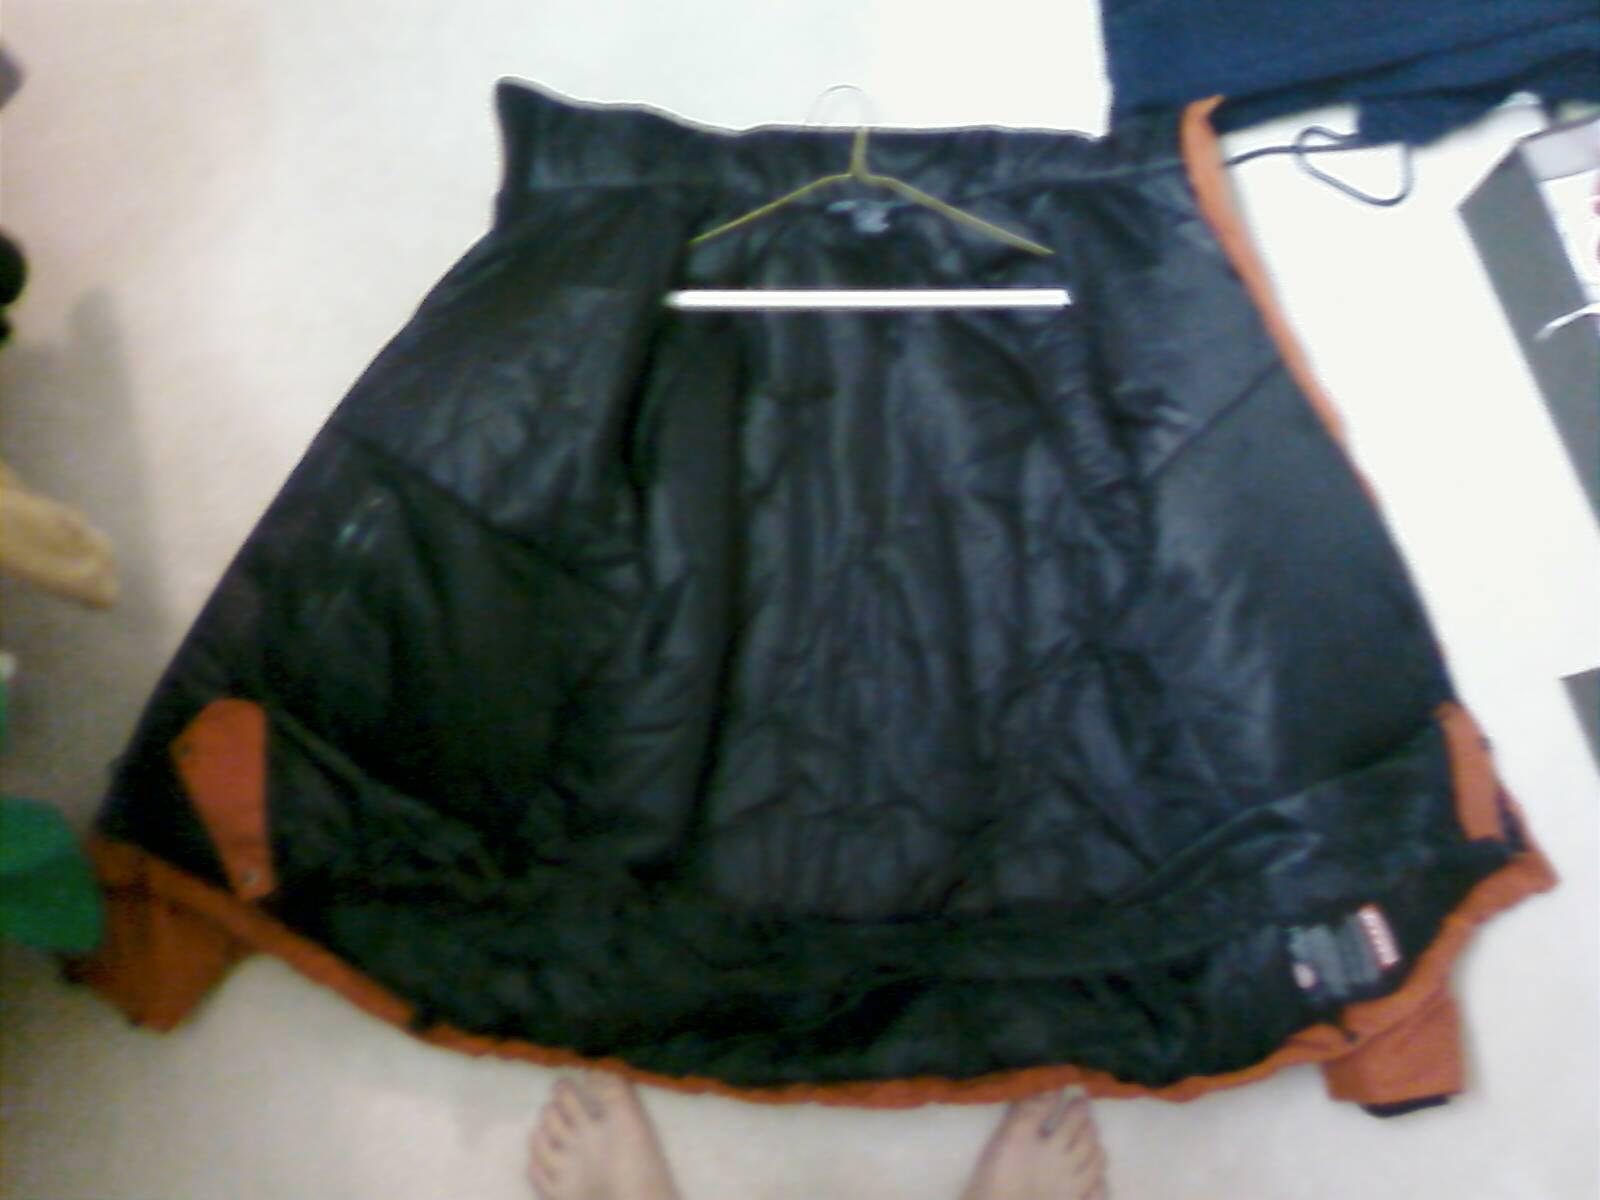 Inside jacket